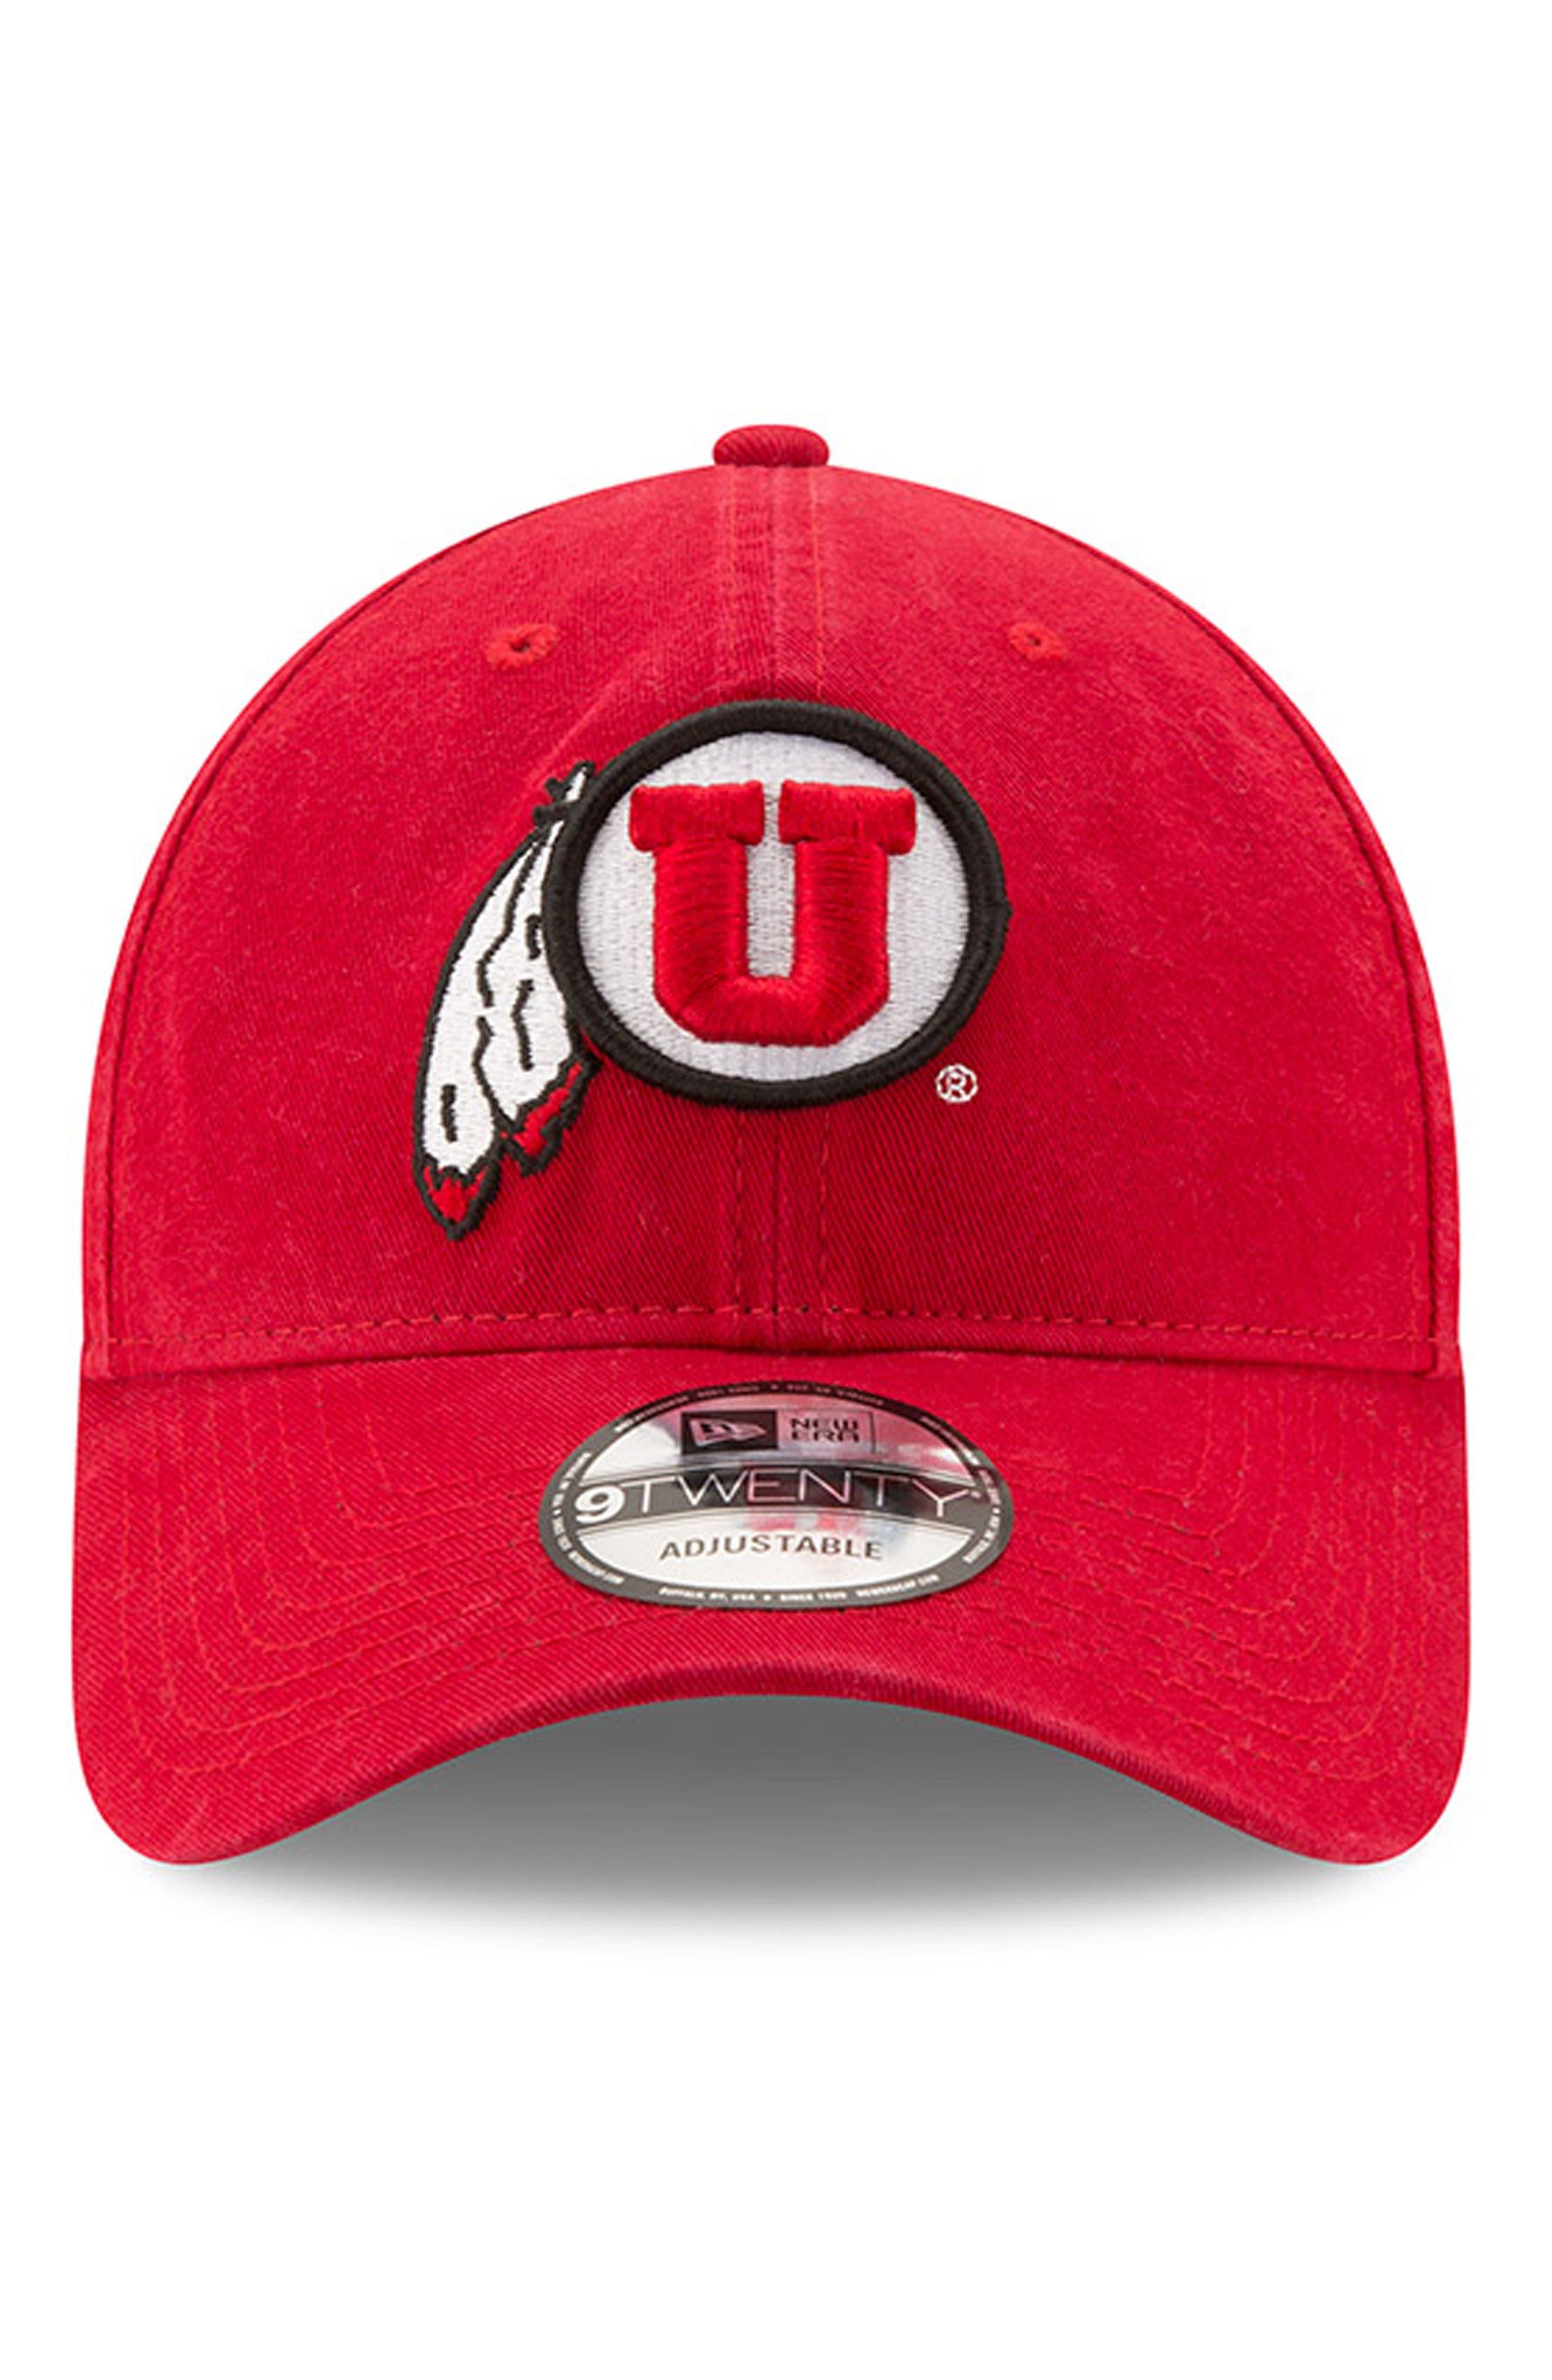 New Era Collegiate Core Classic - Utah Utes Baseball Cap,                             Alternate thumbnail 2, color,                             600